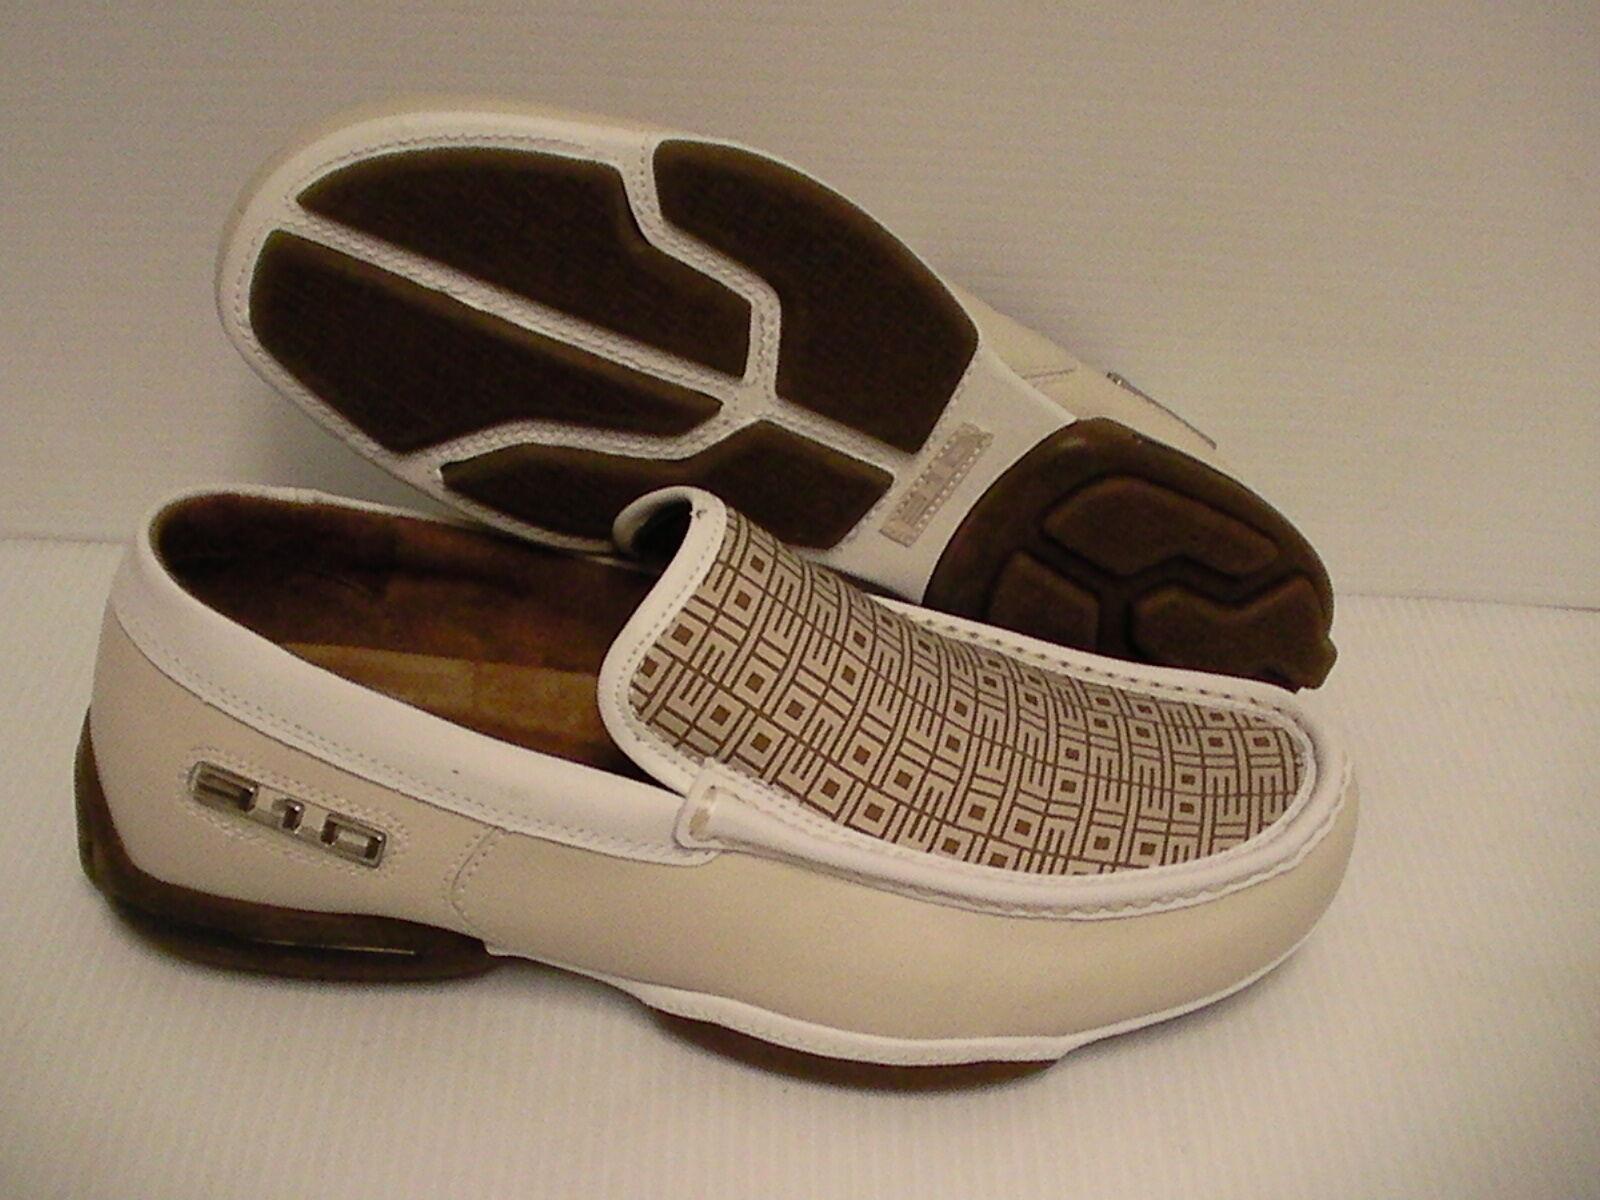 310 Motoring shoes Inscatolamento Casual Naturale Bianco Misura 11.5 US Nuovo